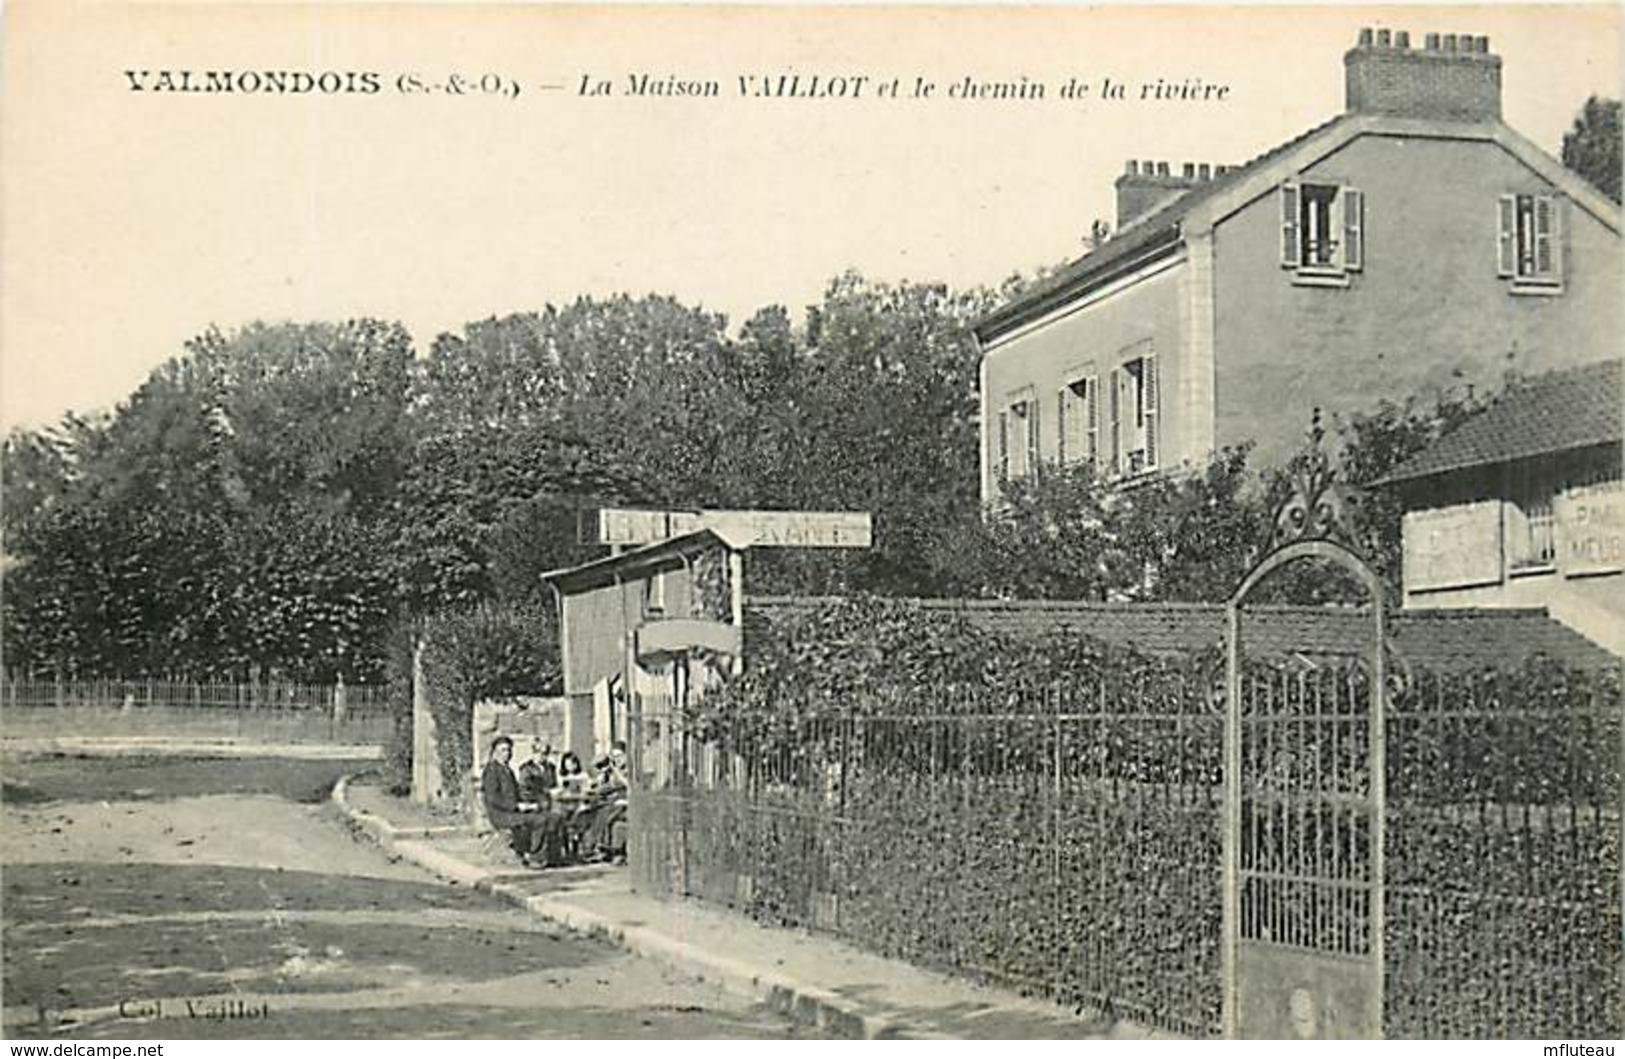 95* VALMONDOIS    Maison Vaillot  MA98,0848 - France